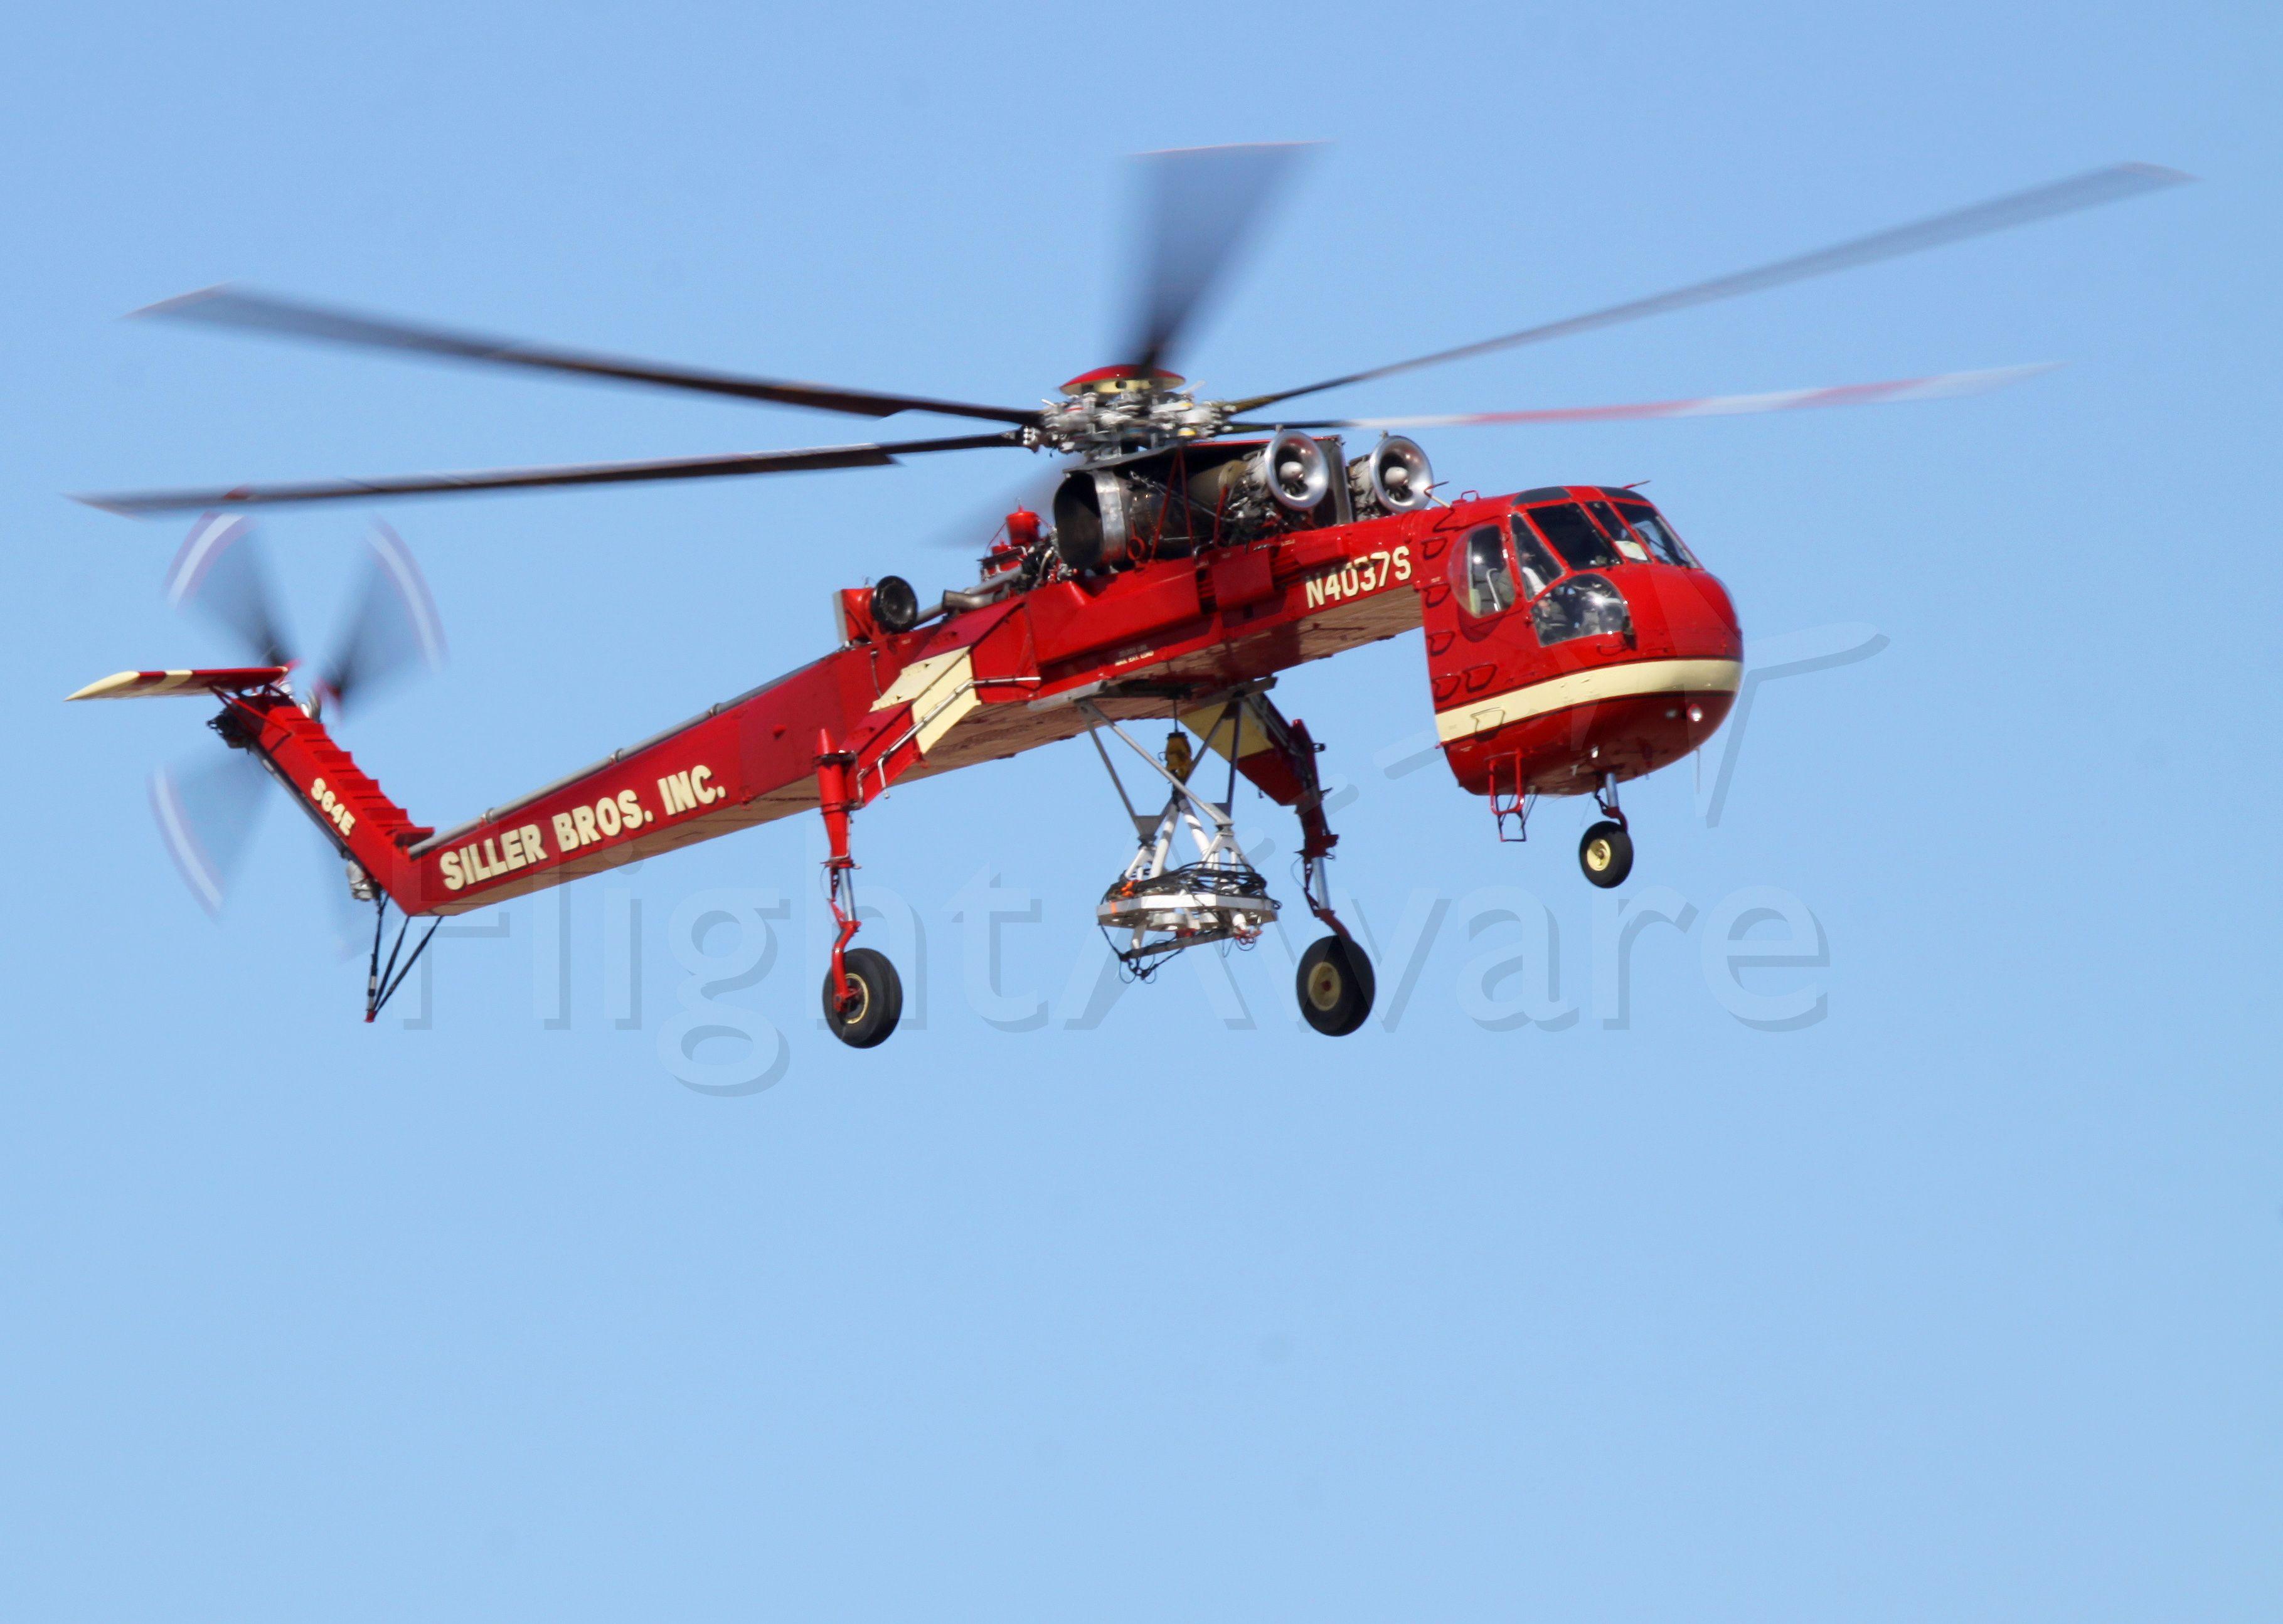 N4037S — - Sikorsky S-64E Skycrane 64-101 - N4037S, Siller Brothers at HOU